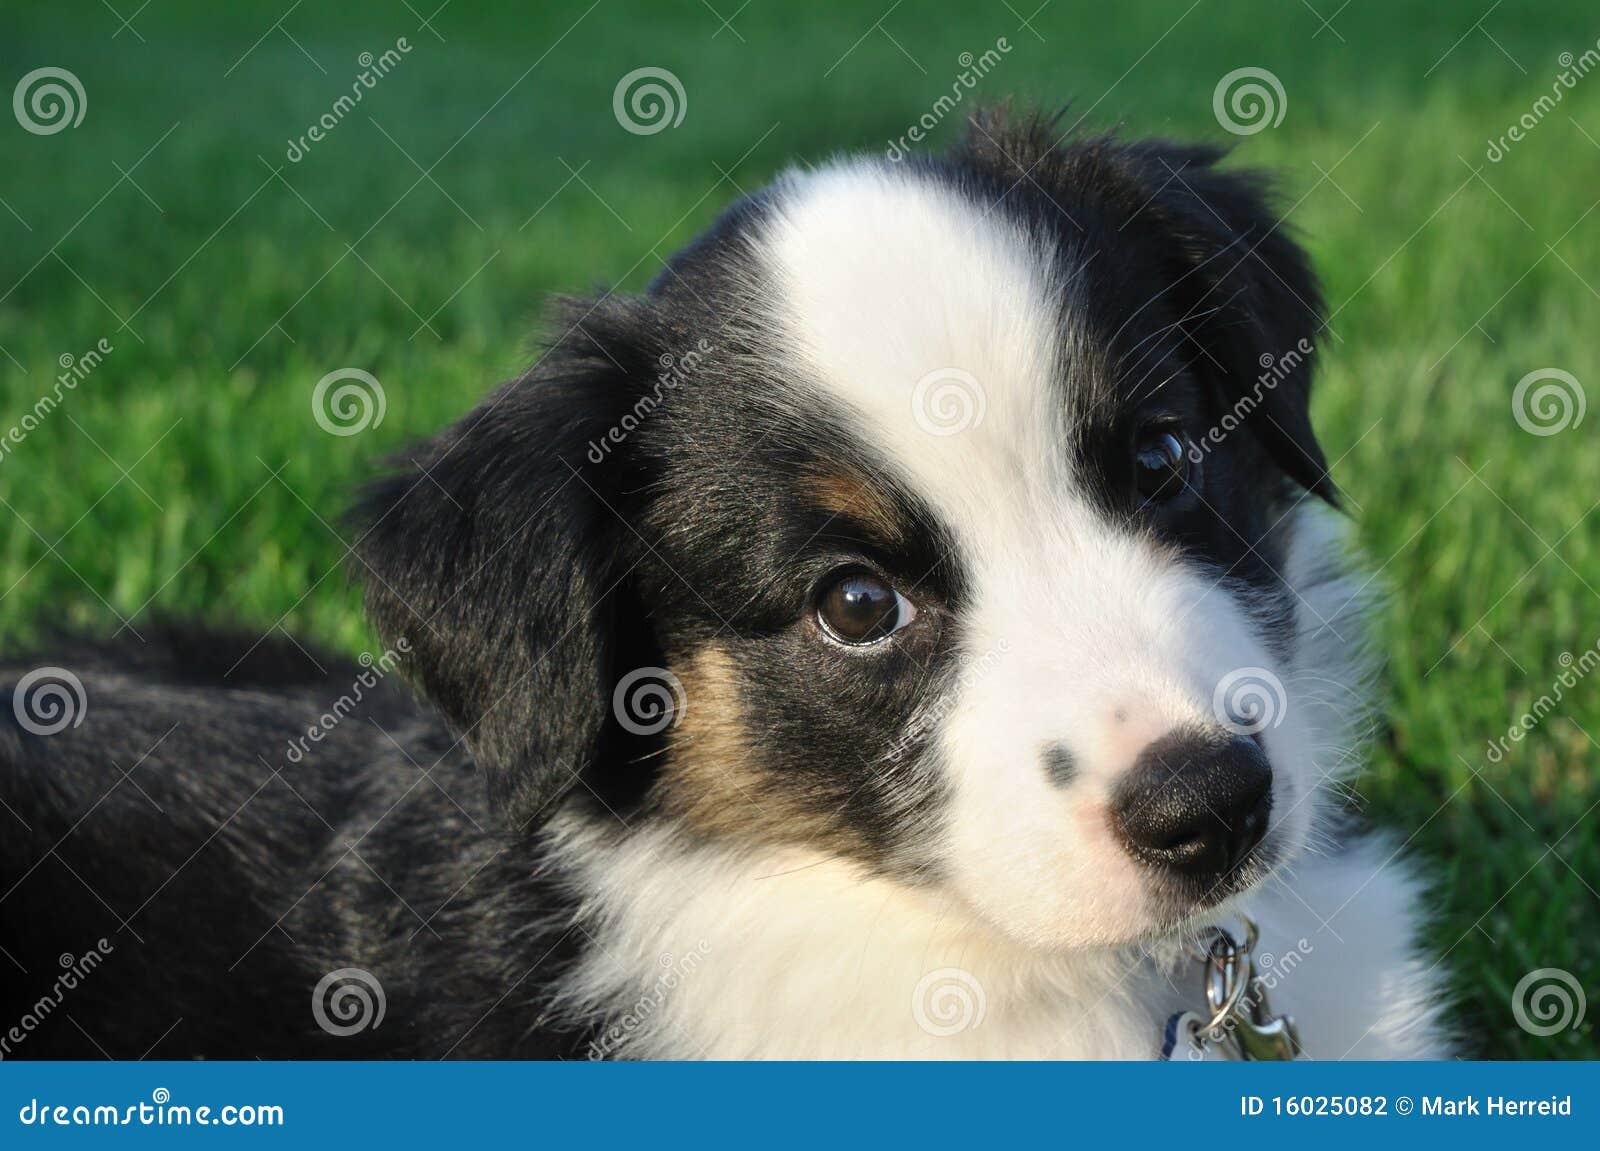 Australian Shepherd (Aussie) Puppy Stock Photography - Image: 16025082